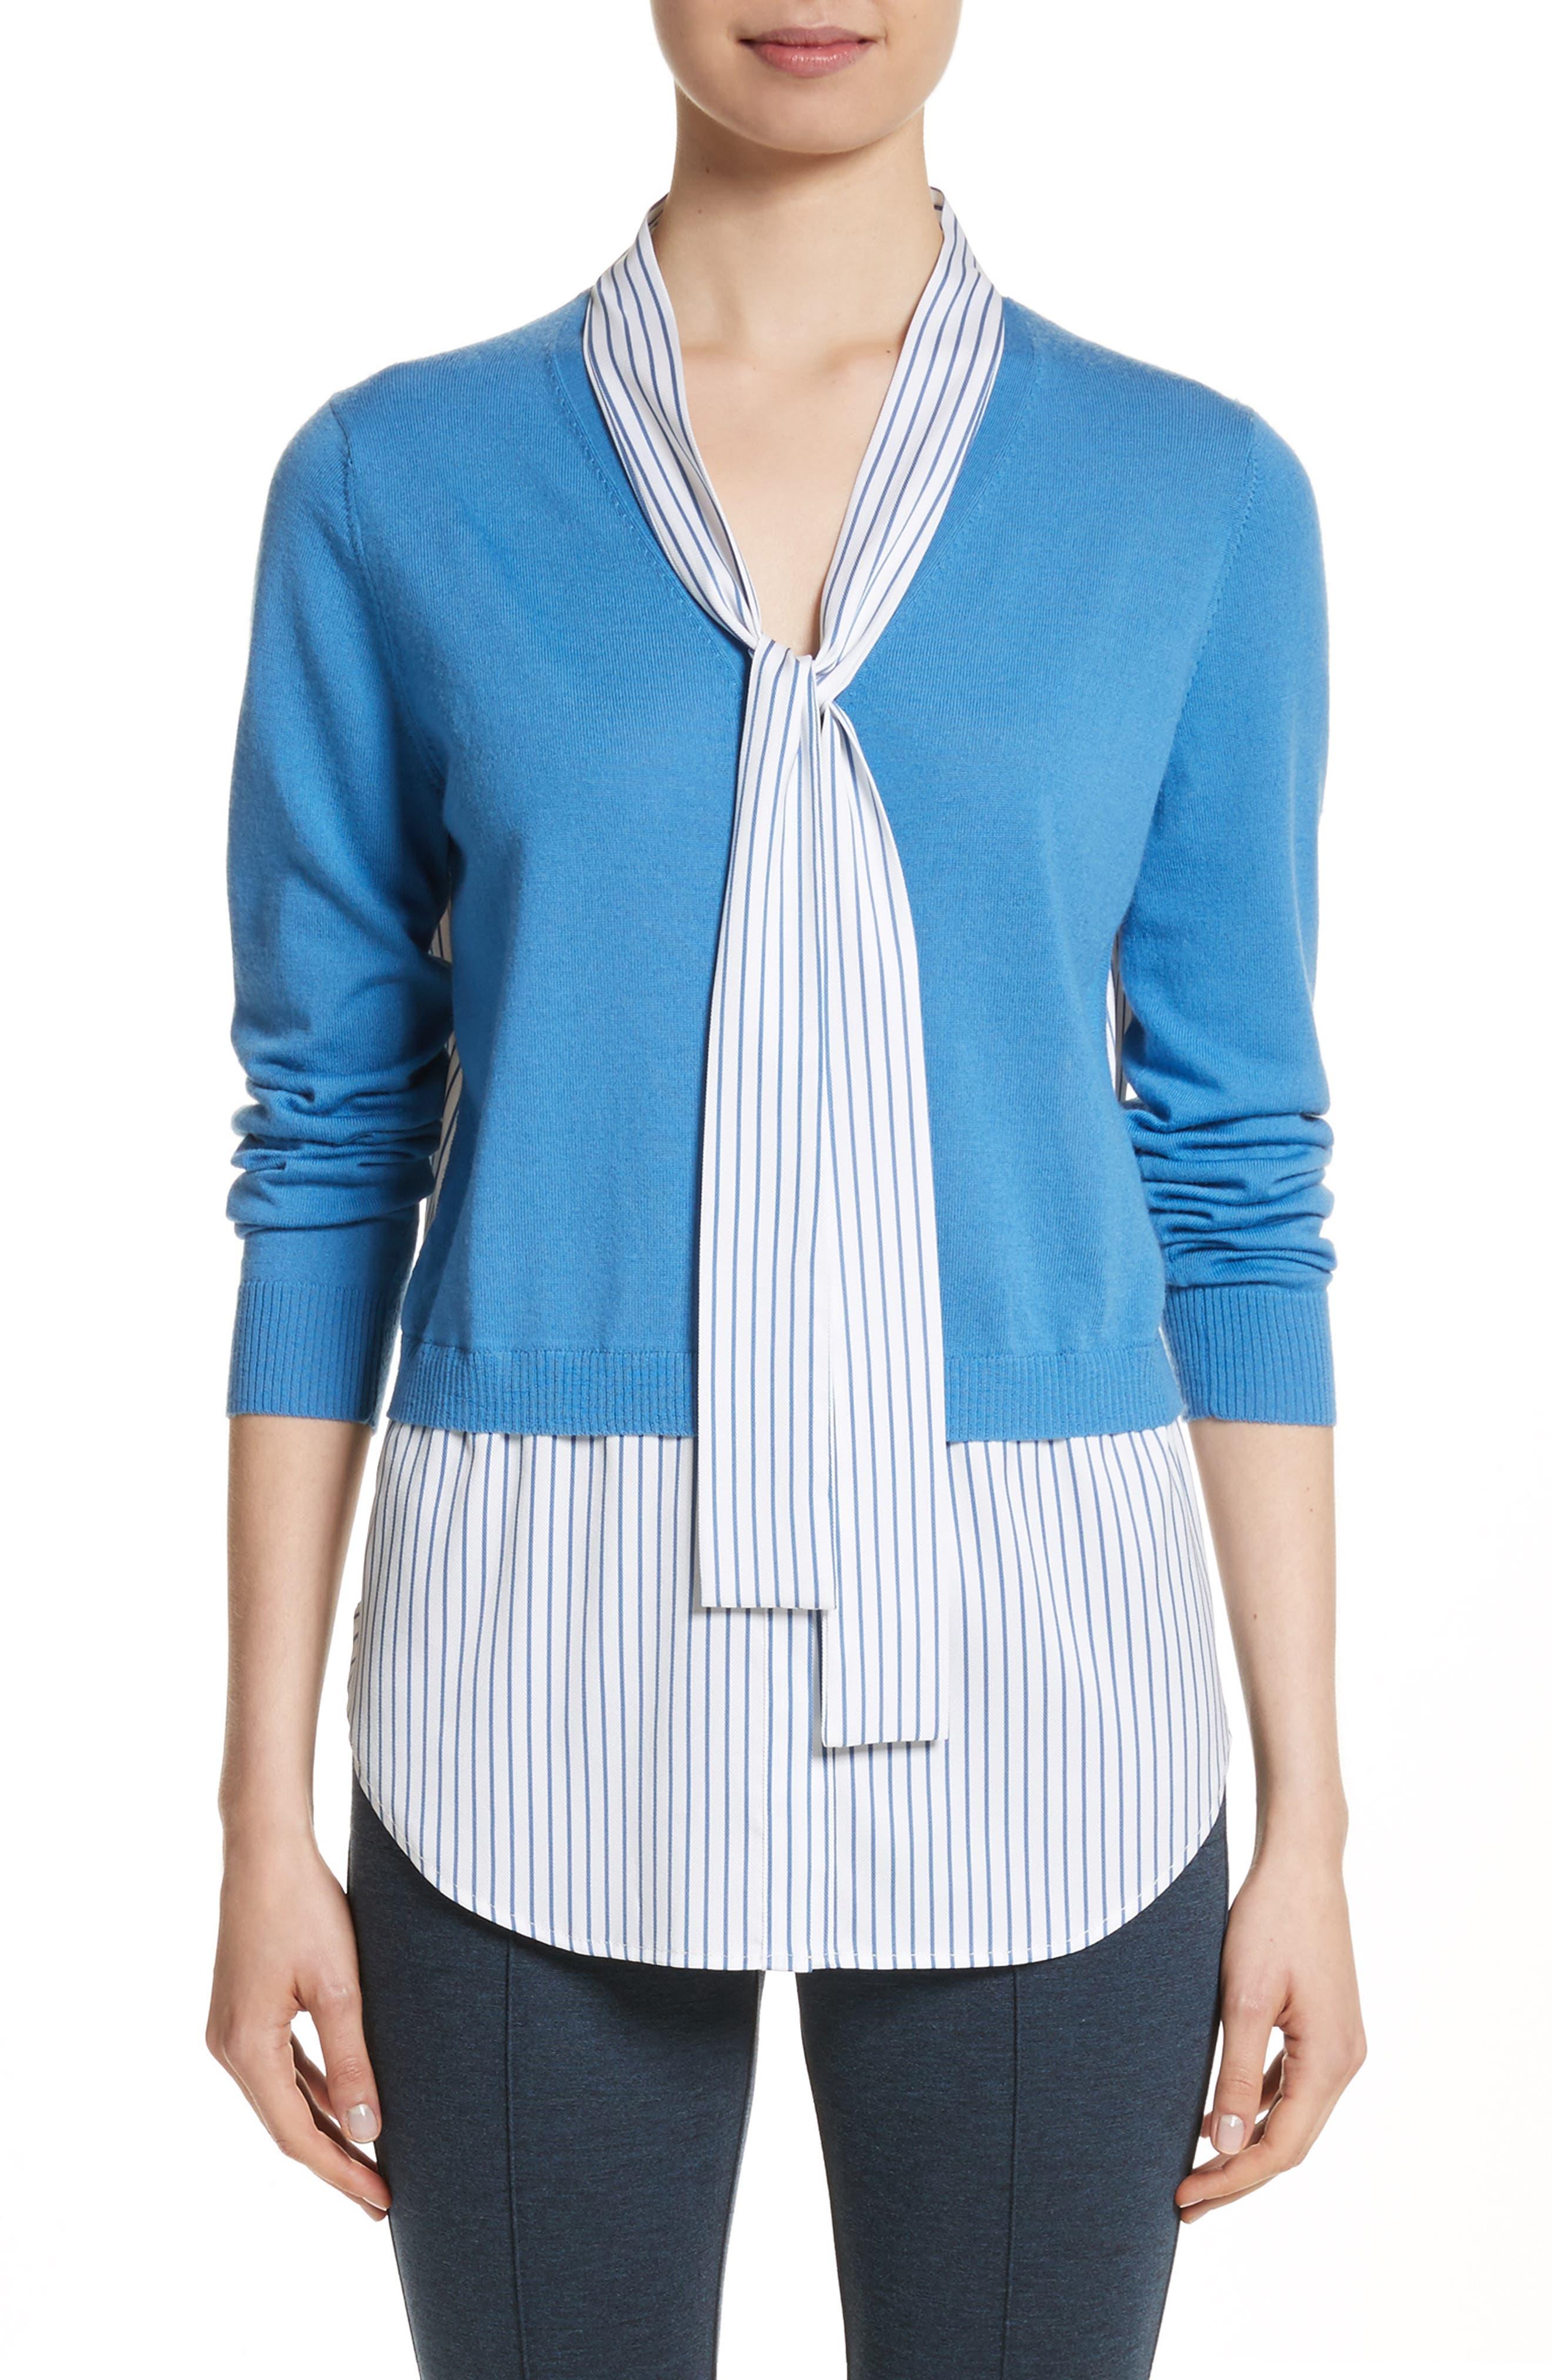 Main Image - St. John Collection Layered Jersey Knit Cardigan